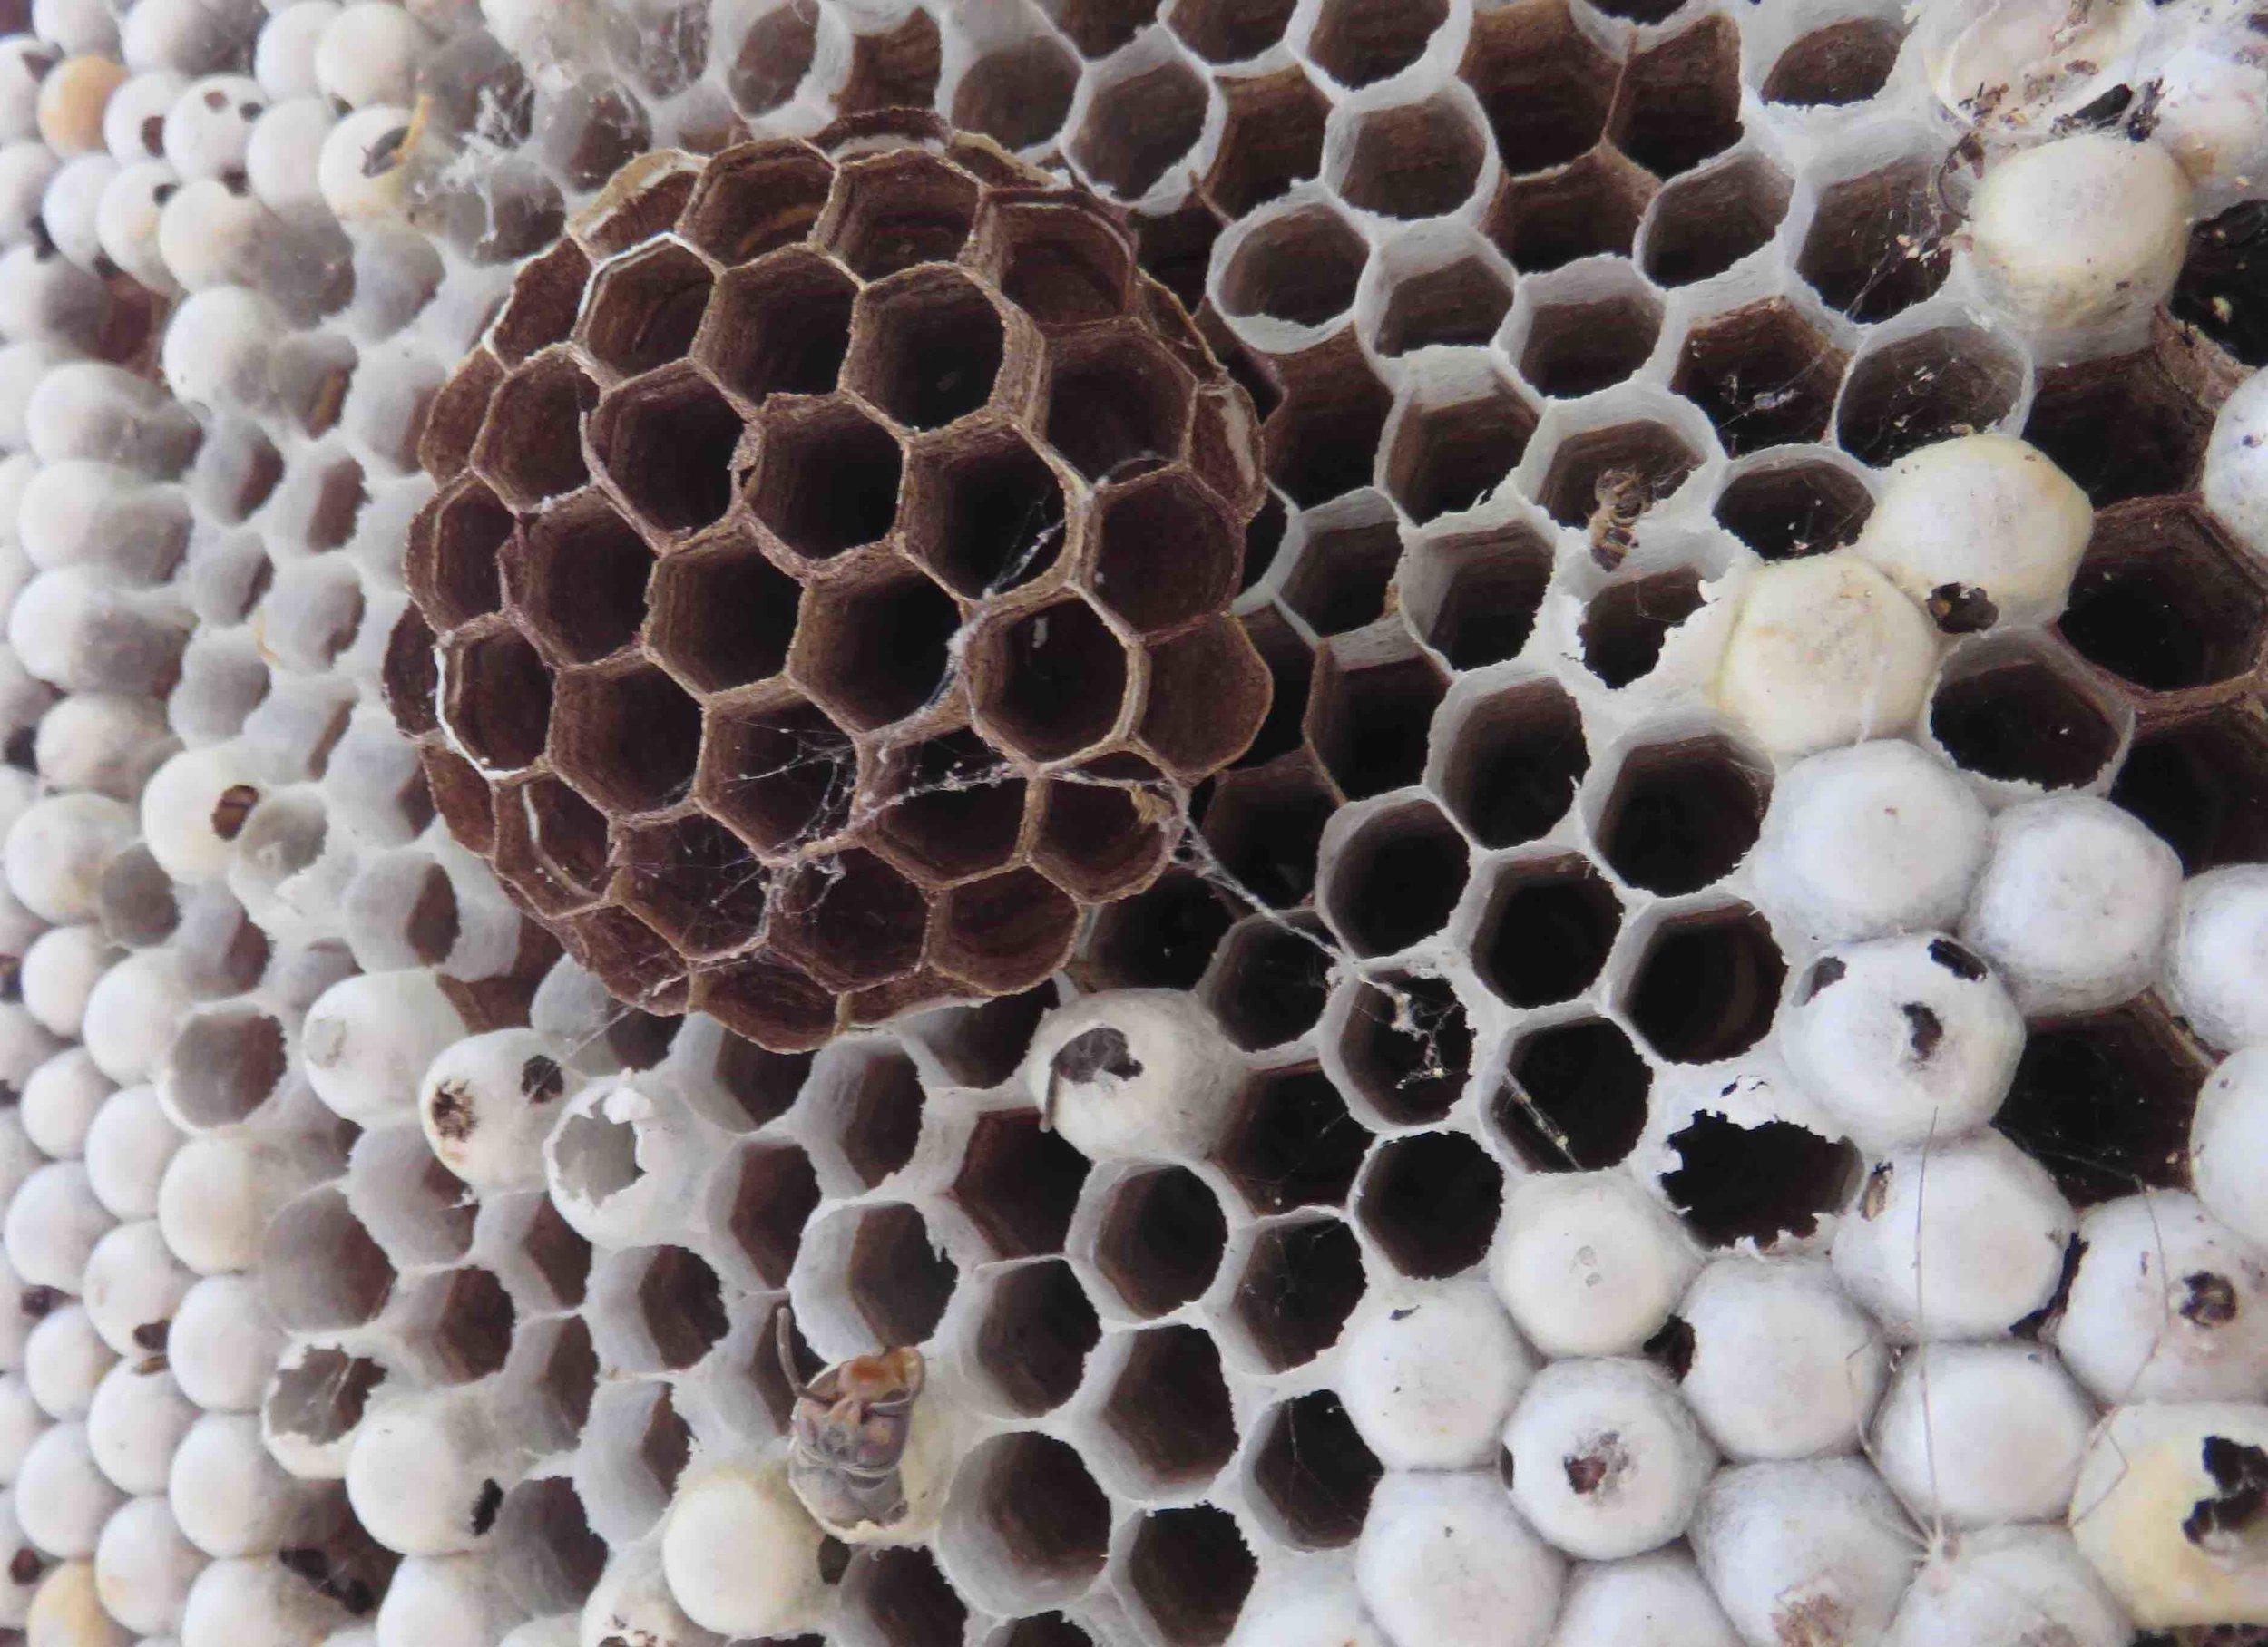 Nid de frelon asiatique mort : en bas de la photo,tête de frelon mort.